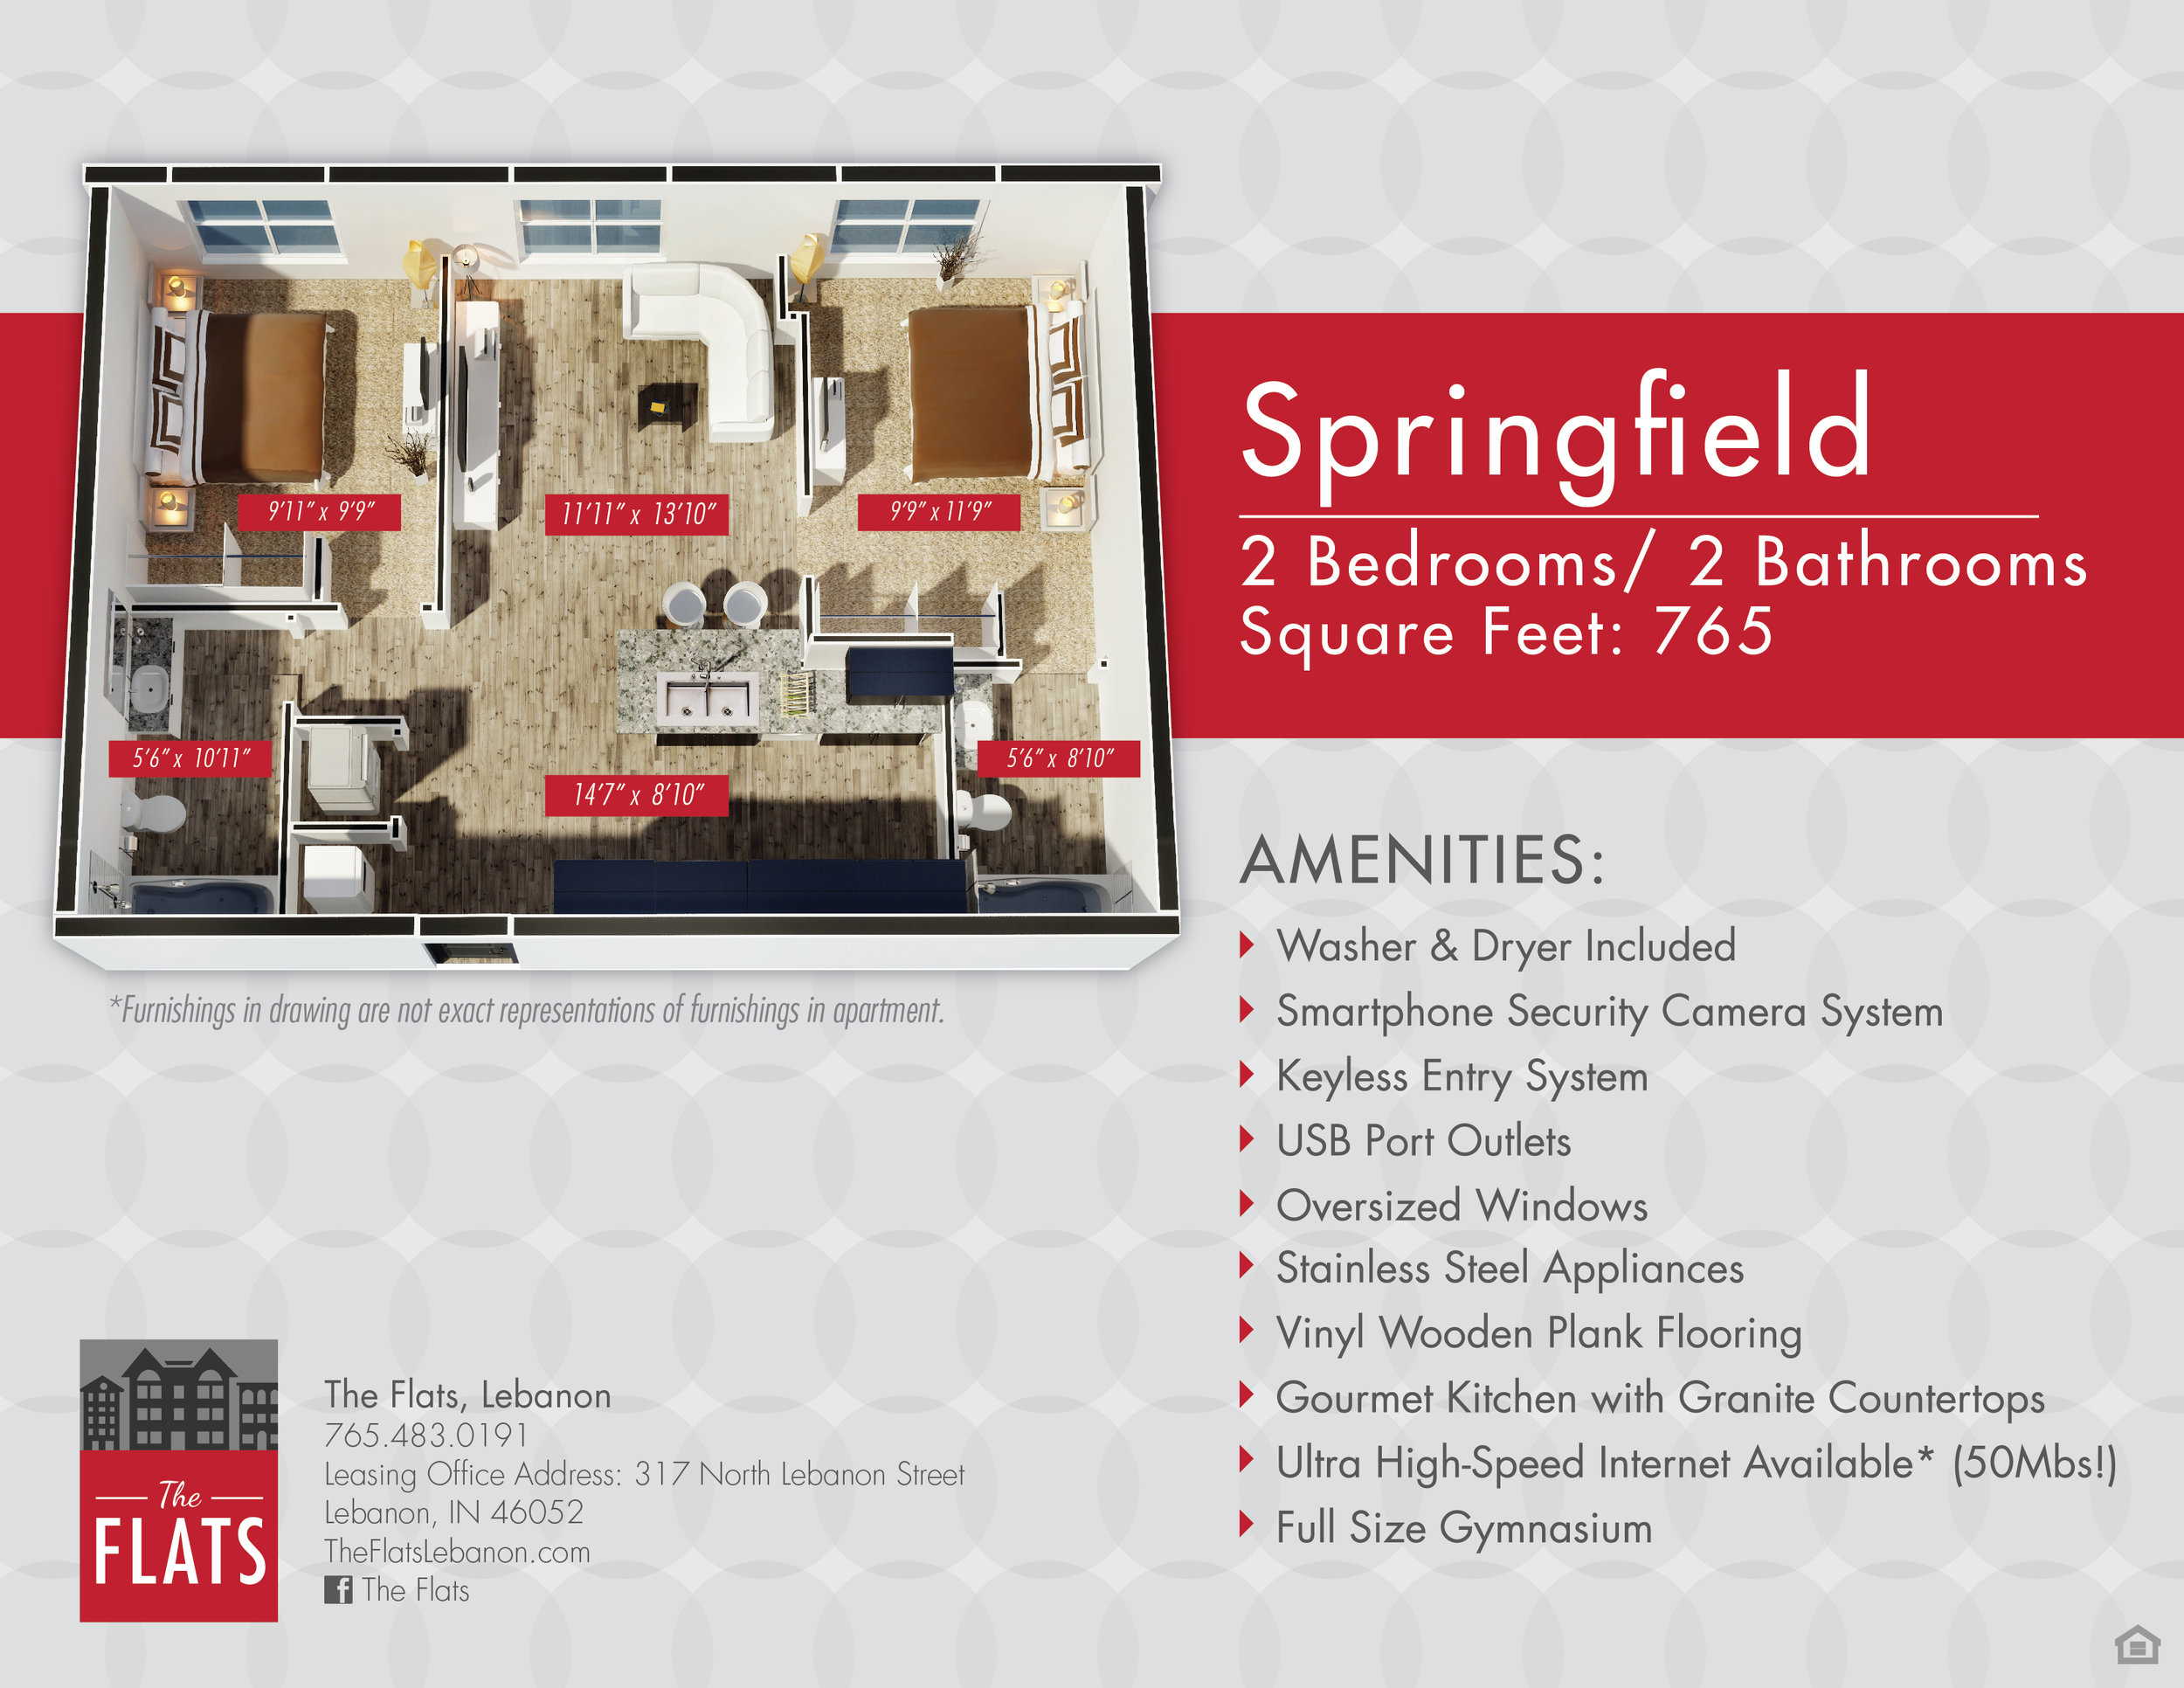 Springfield-01.jpg